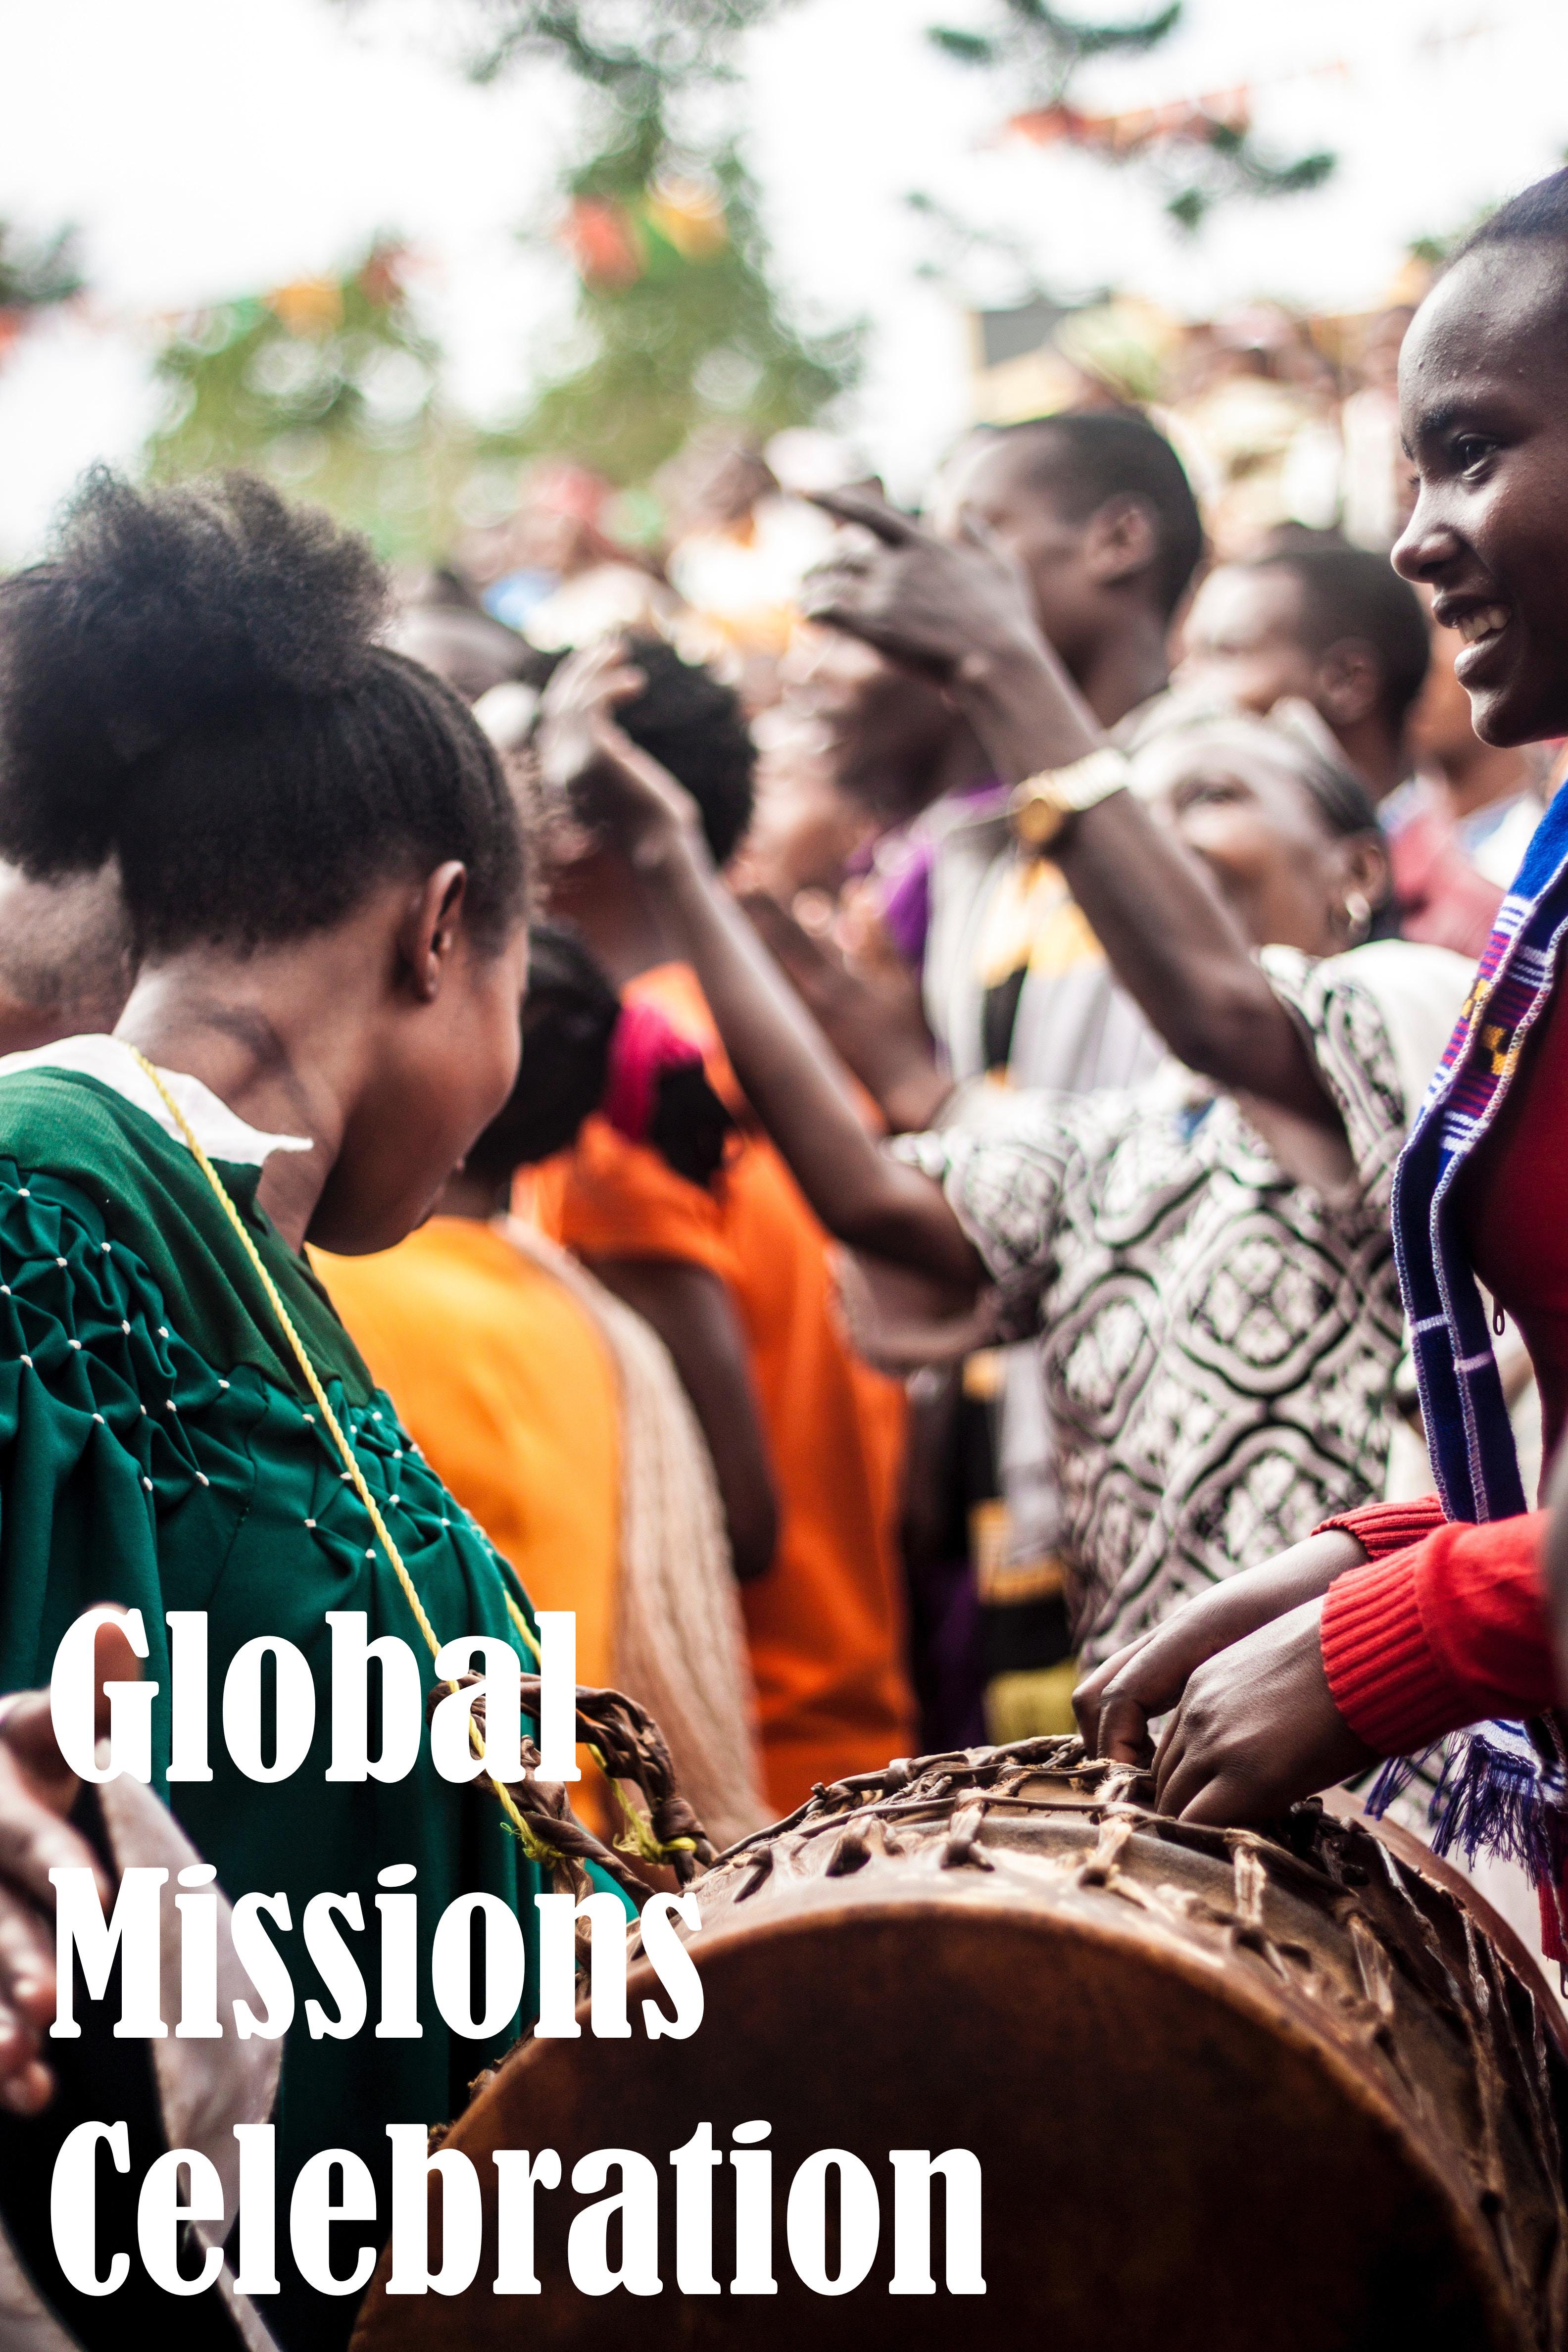 Global missions celebration